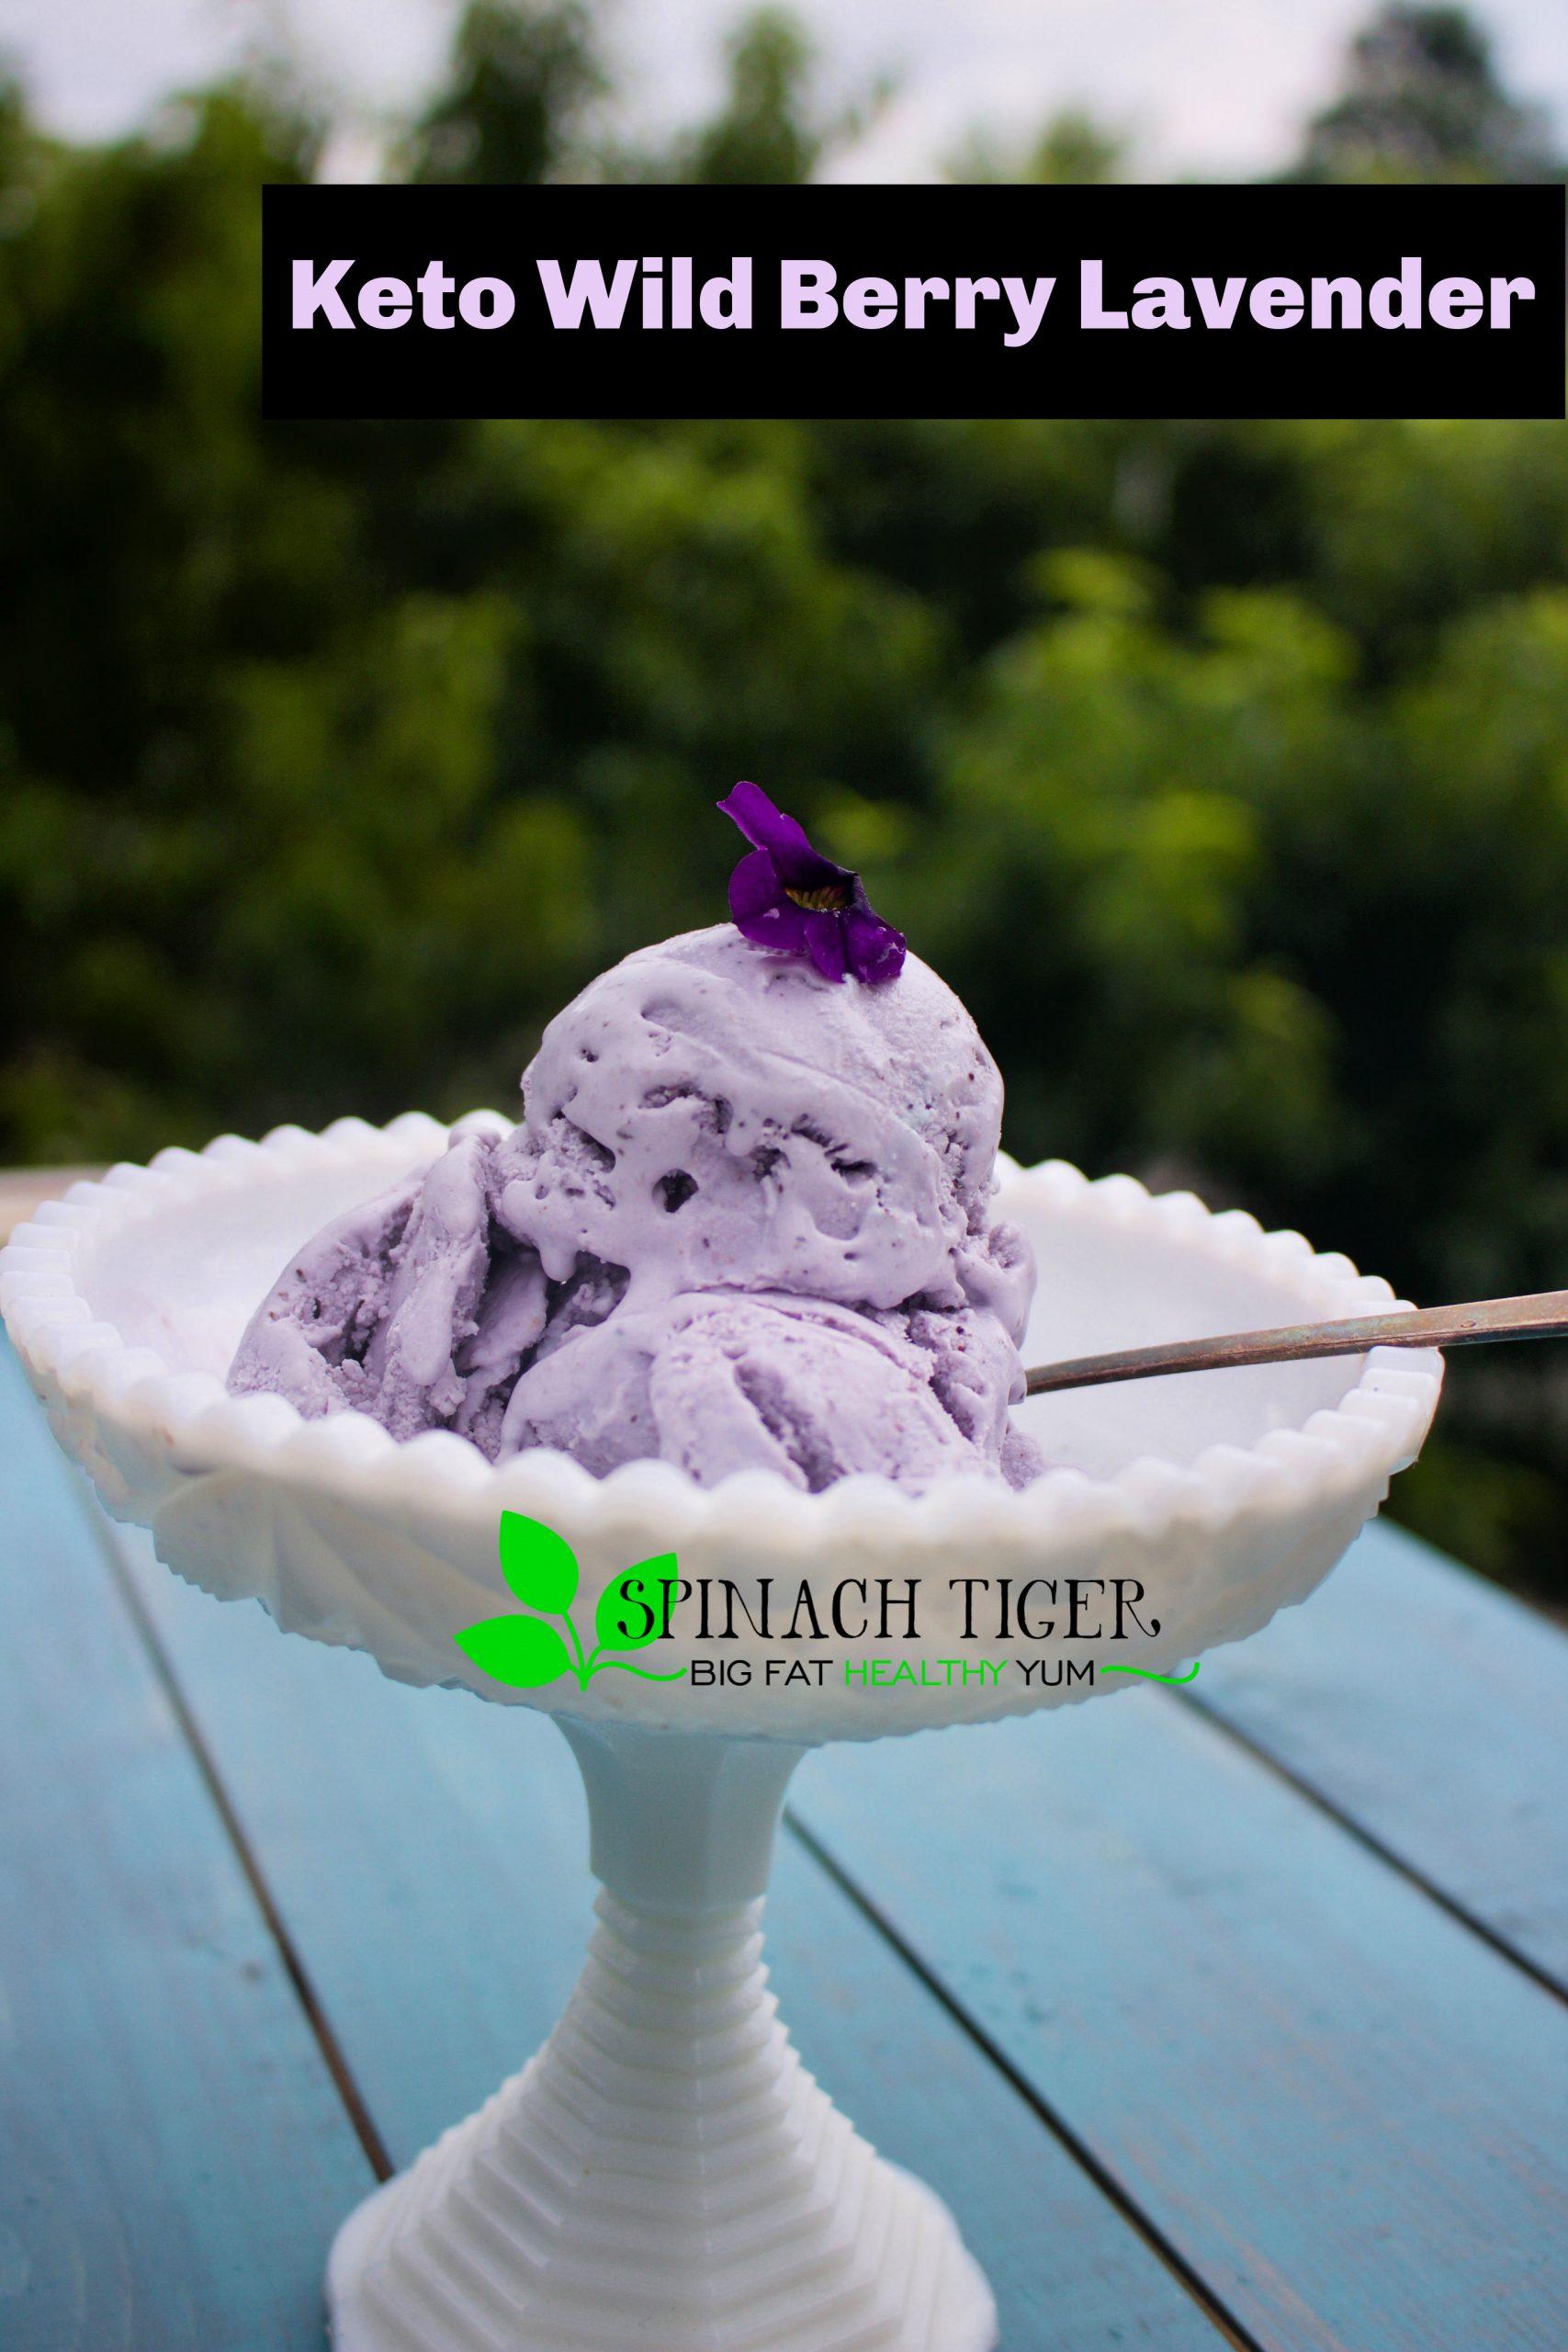 Make Jenny's Wild Berry Lavender recipe SUGAR FREE, GRAIN FREE, KETO Friendly. I used Blueberries, Lavender essential oil, and Swerve to make this creamy dreamy ice cream come true. #ketoicecream #spinachtiger via @angelaroberts